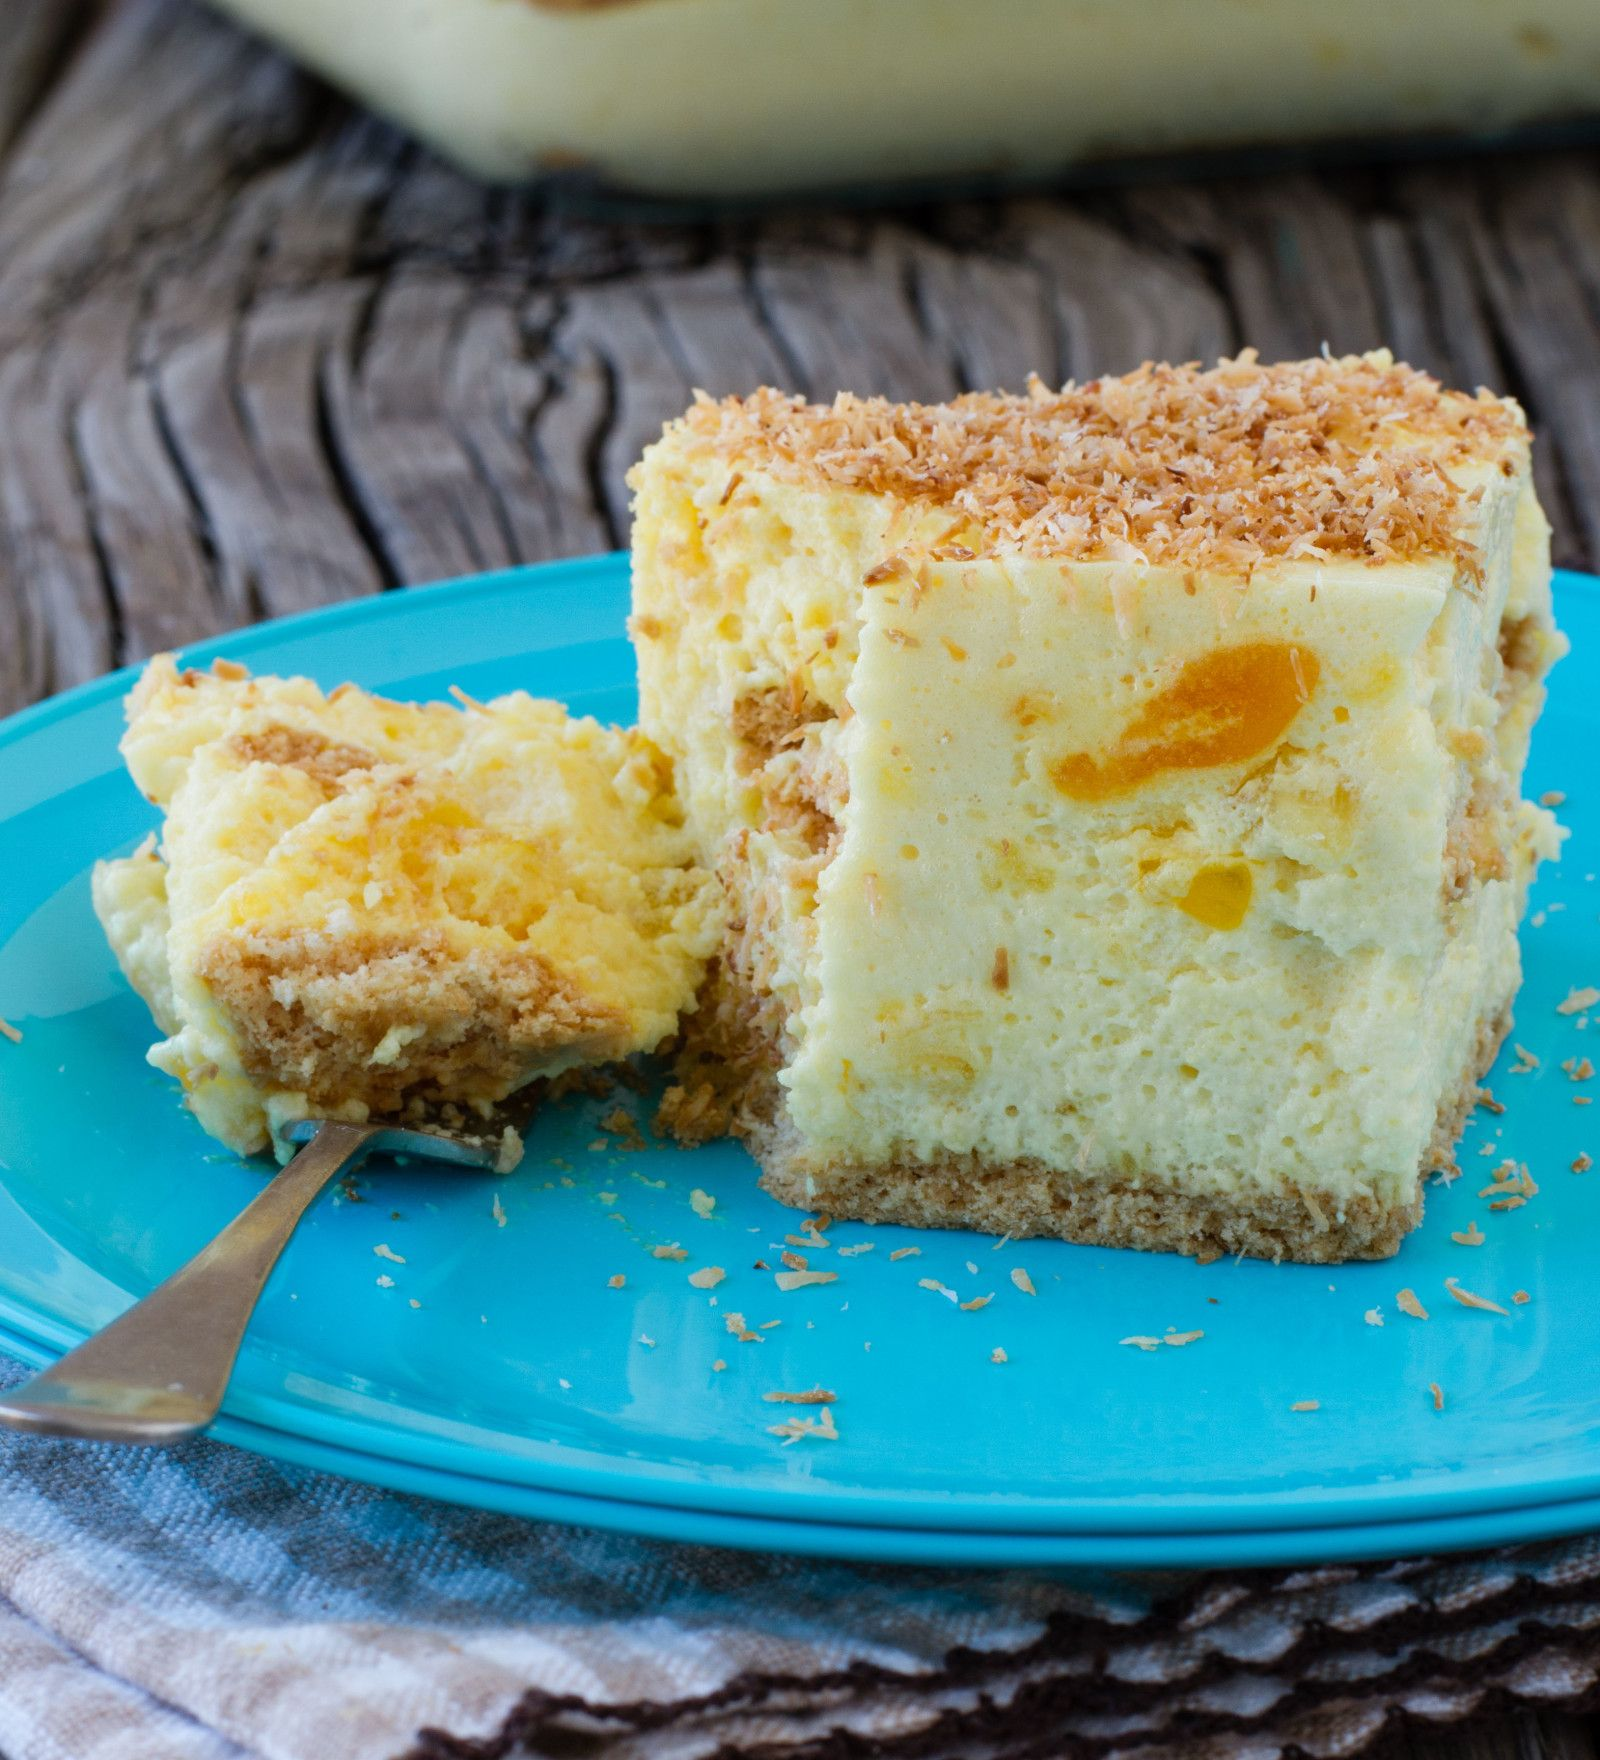 No Bake Pineapple Fridge Tart Recipe Tart Recipes Sweet Tarts Pineapple Dessert Recipes